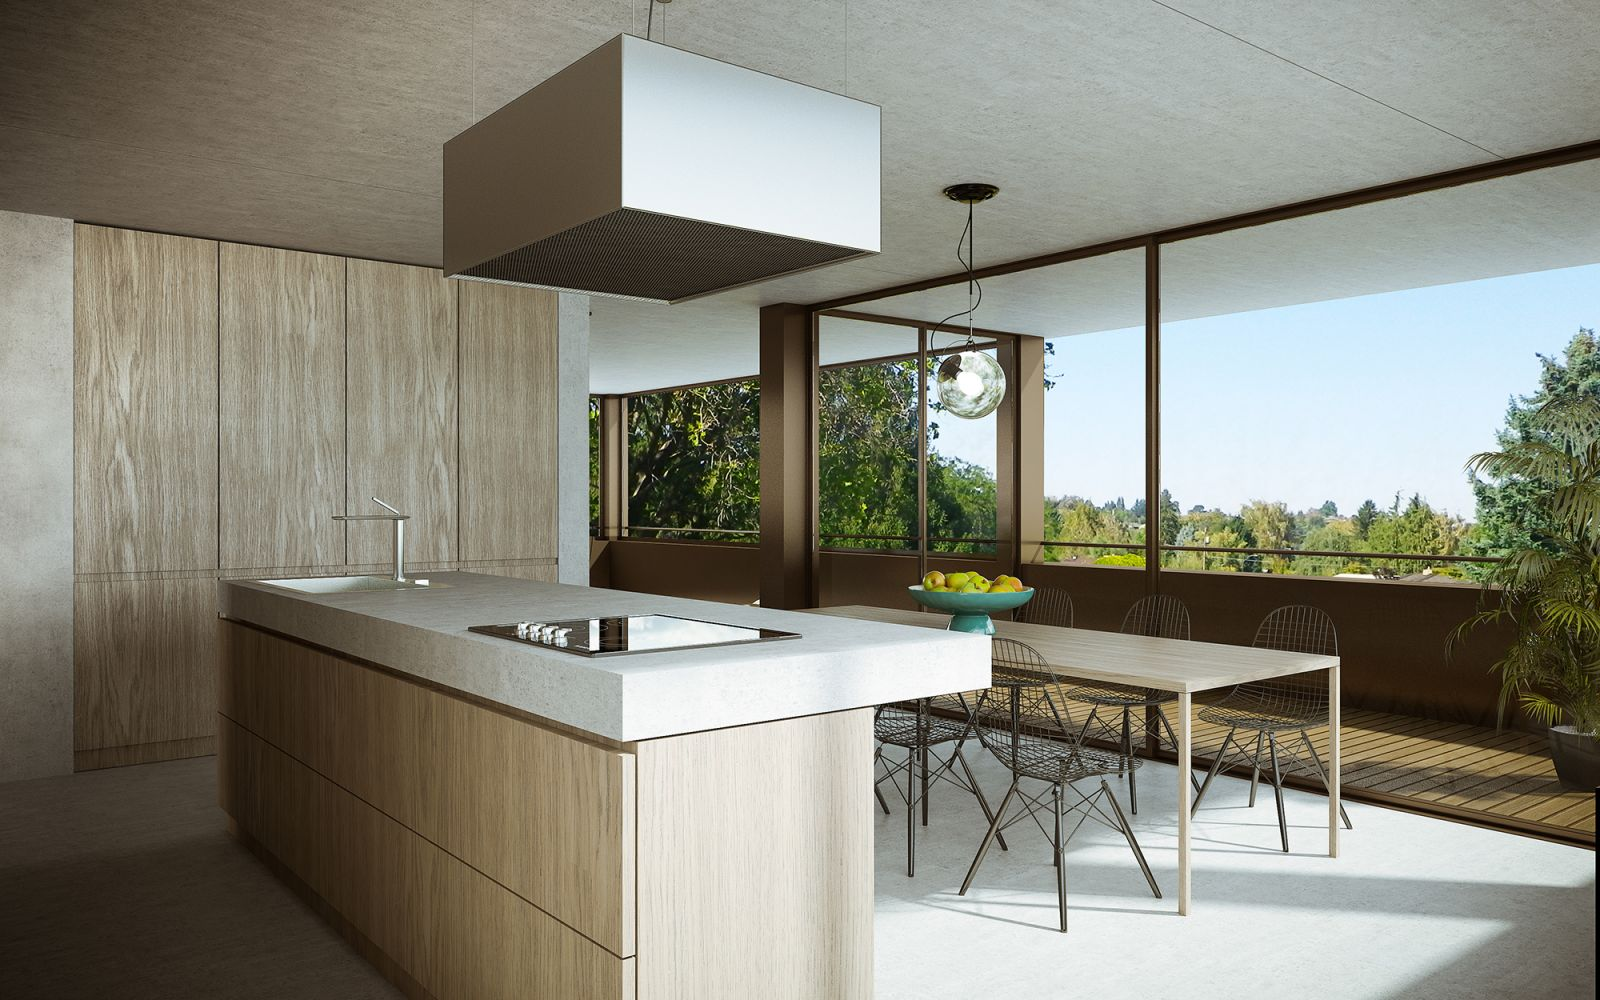 Le Vallon de Villars - Apartments 241